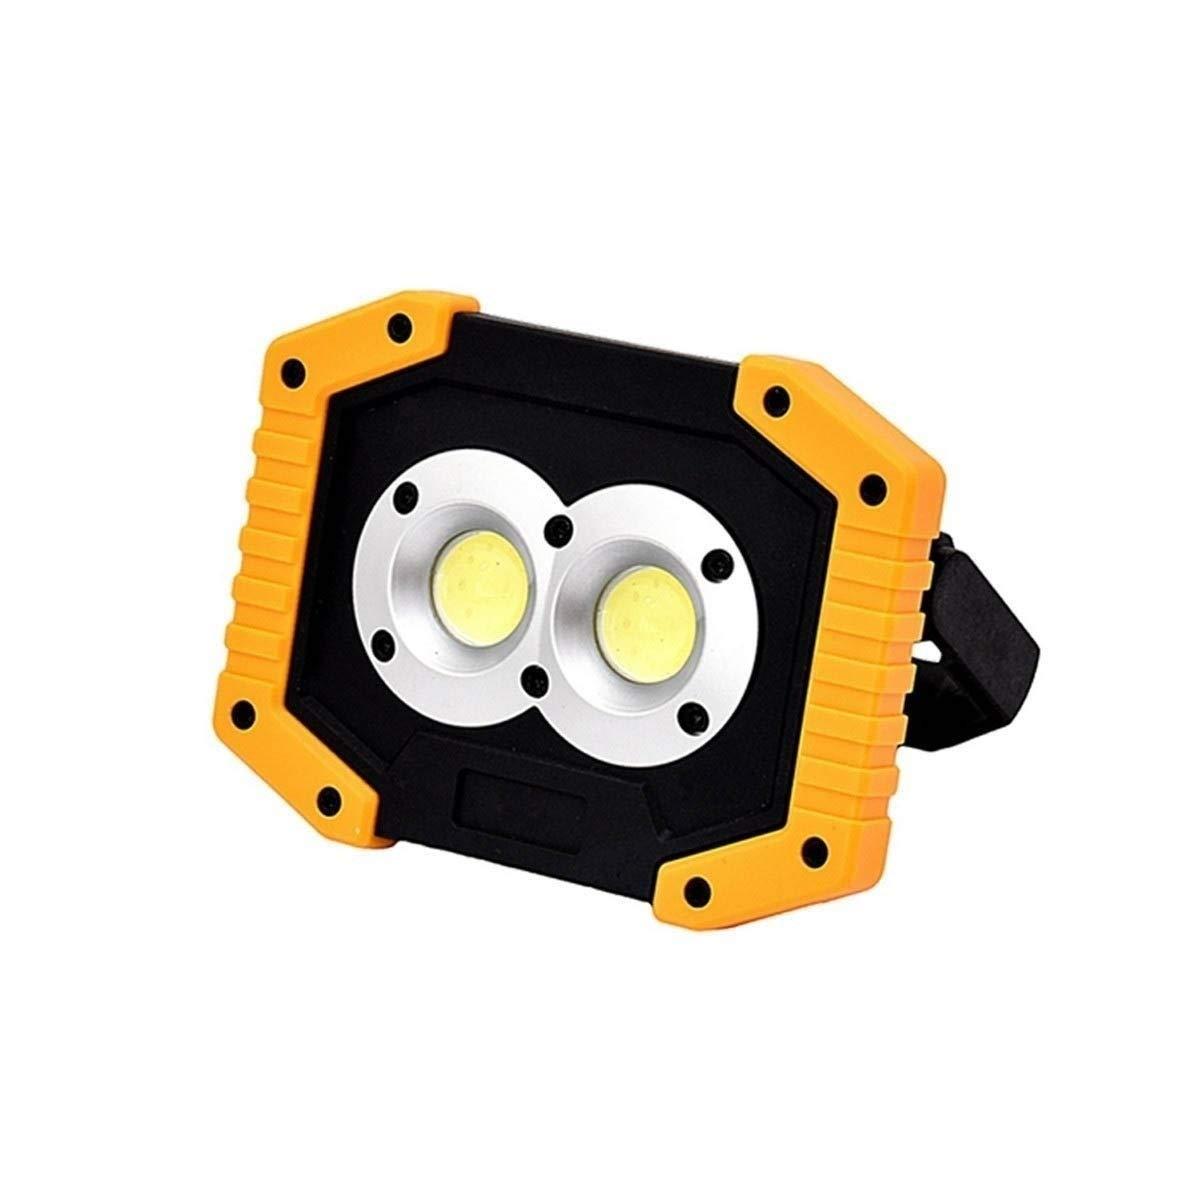 MYXMY COB Charging Flood Light Portable Emergency Light 20W Field Camping Emergency Lighting USB